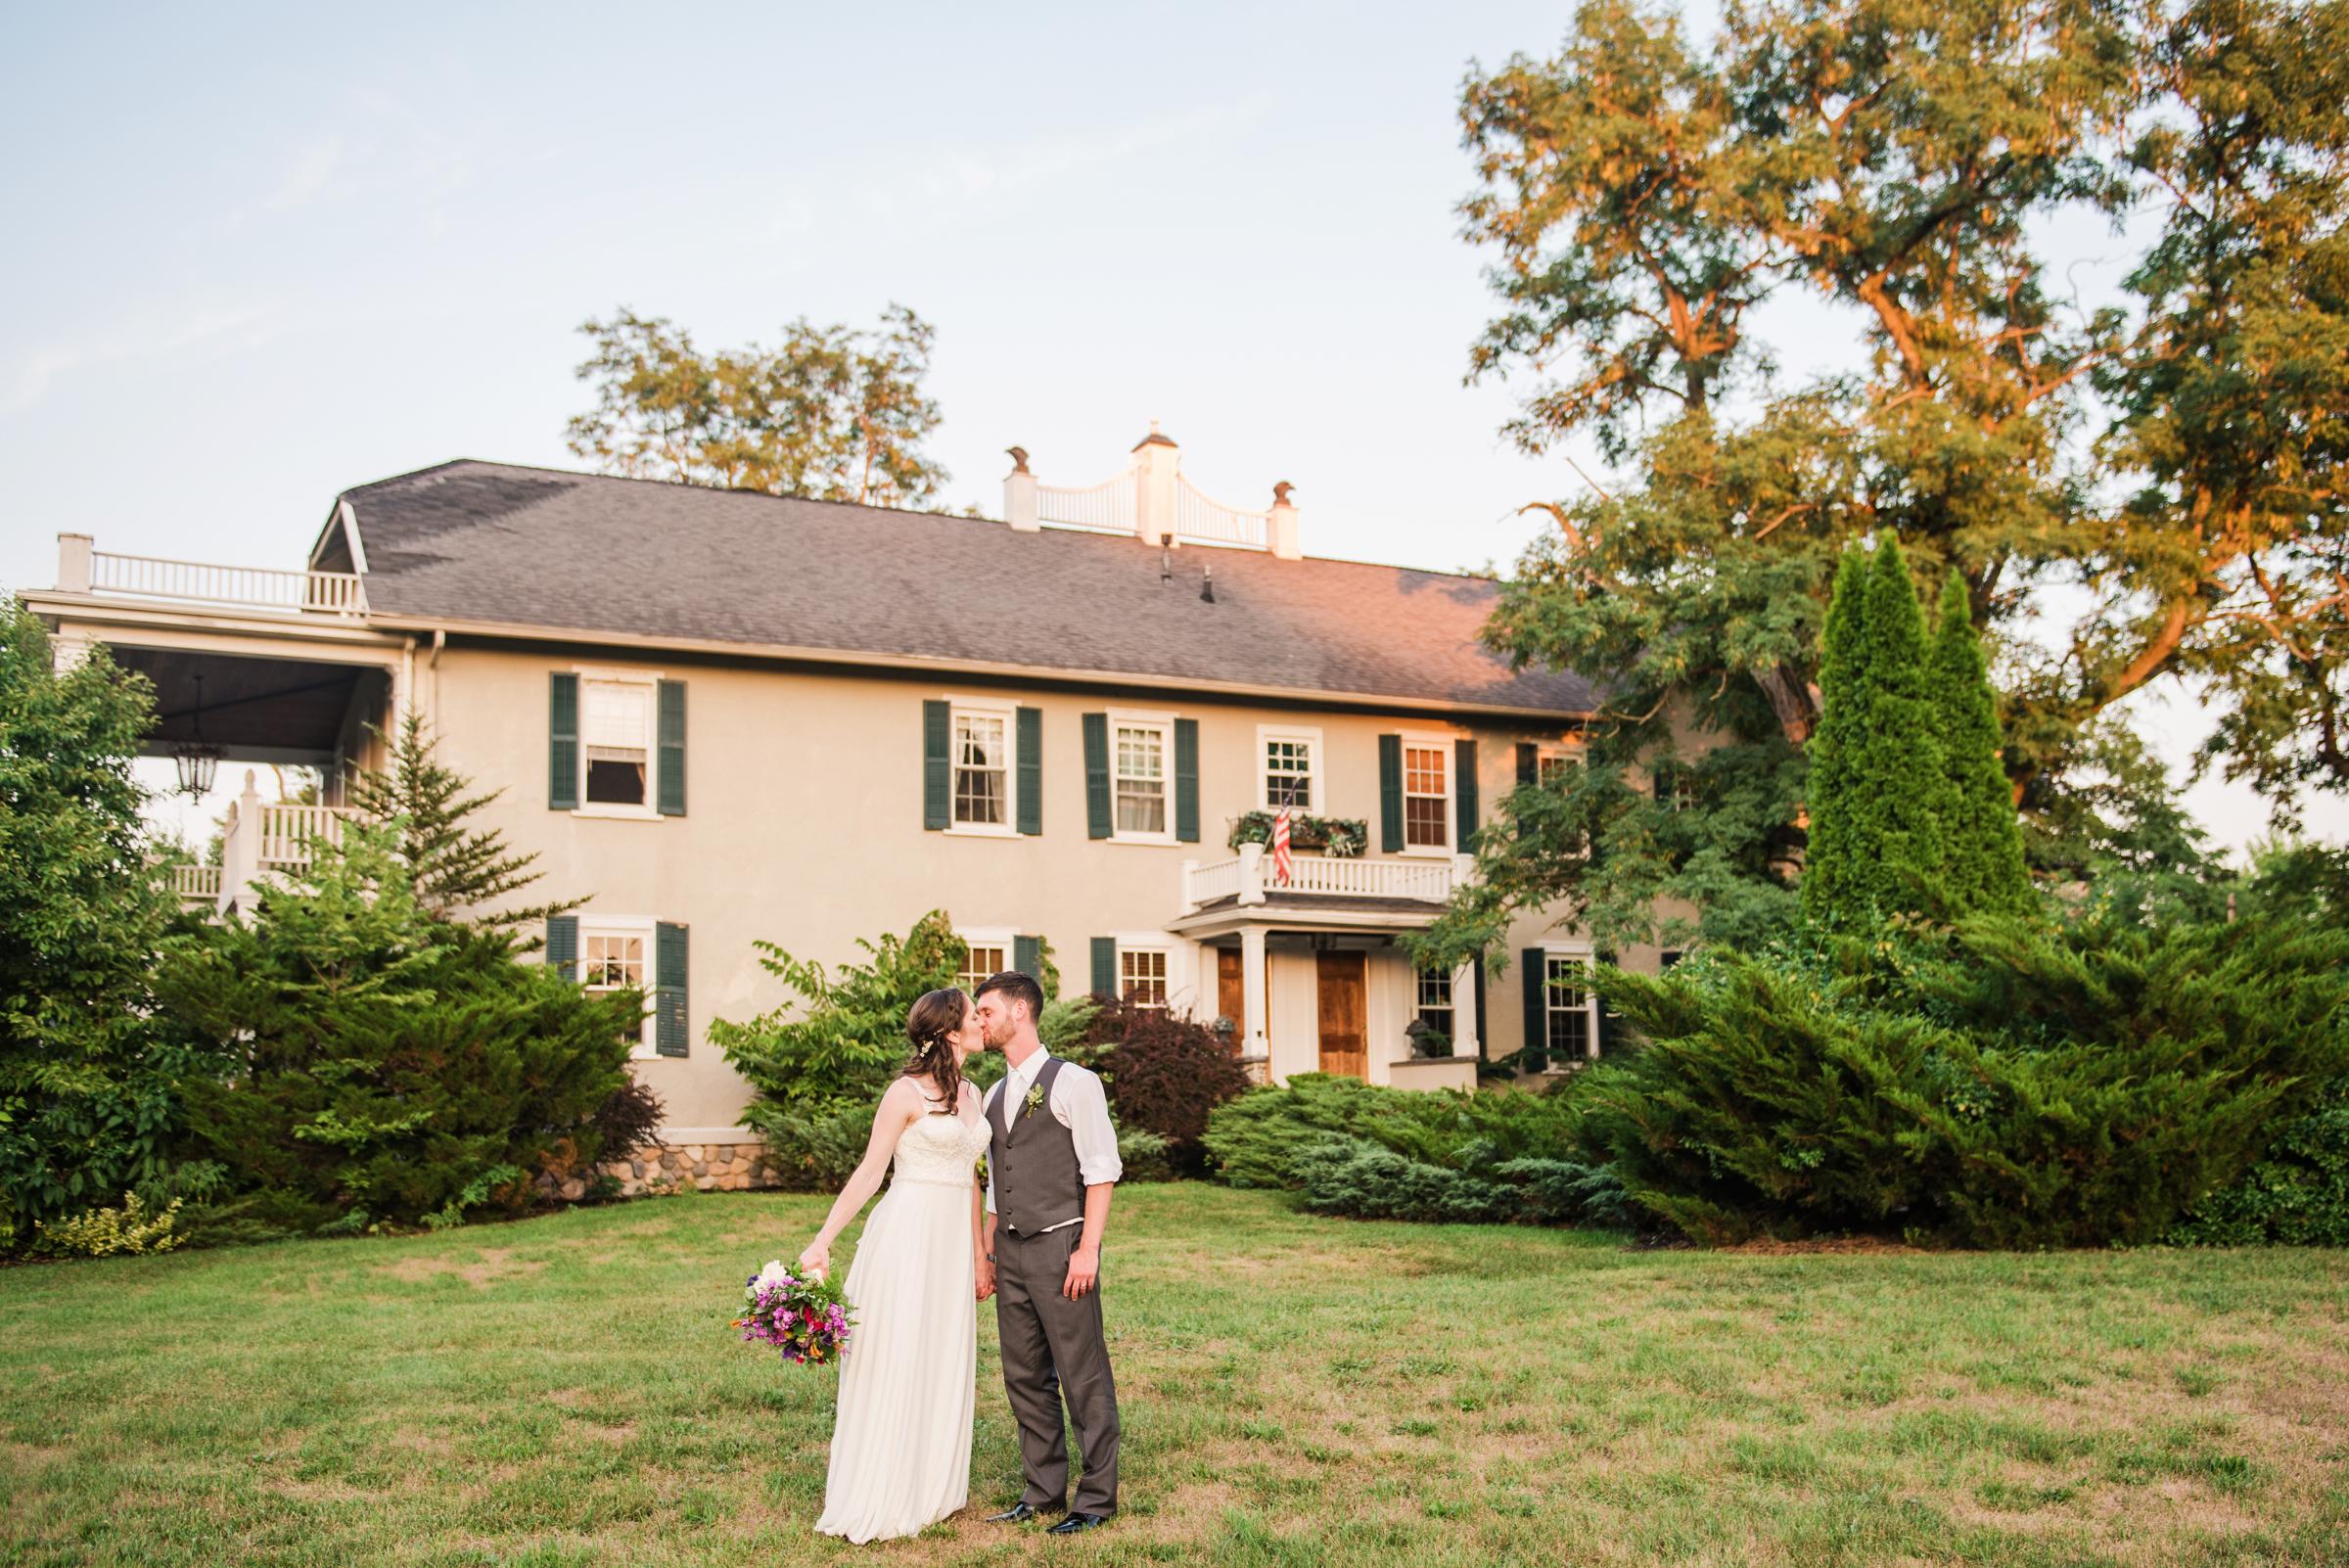 Jerris_Wadsworth_Wedding_Barn_Rochester_Wedding_JILL_STUDIO_Rochester_NY_Photographer_DSC_3085.jpg